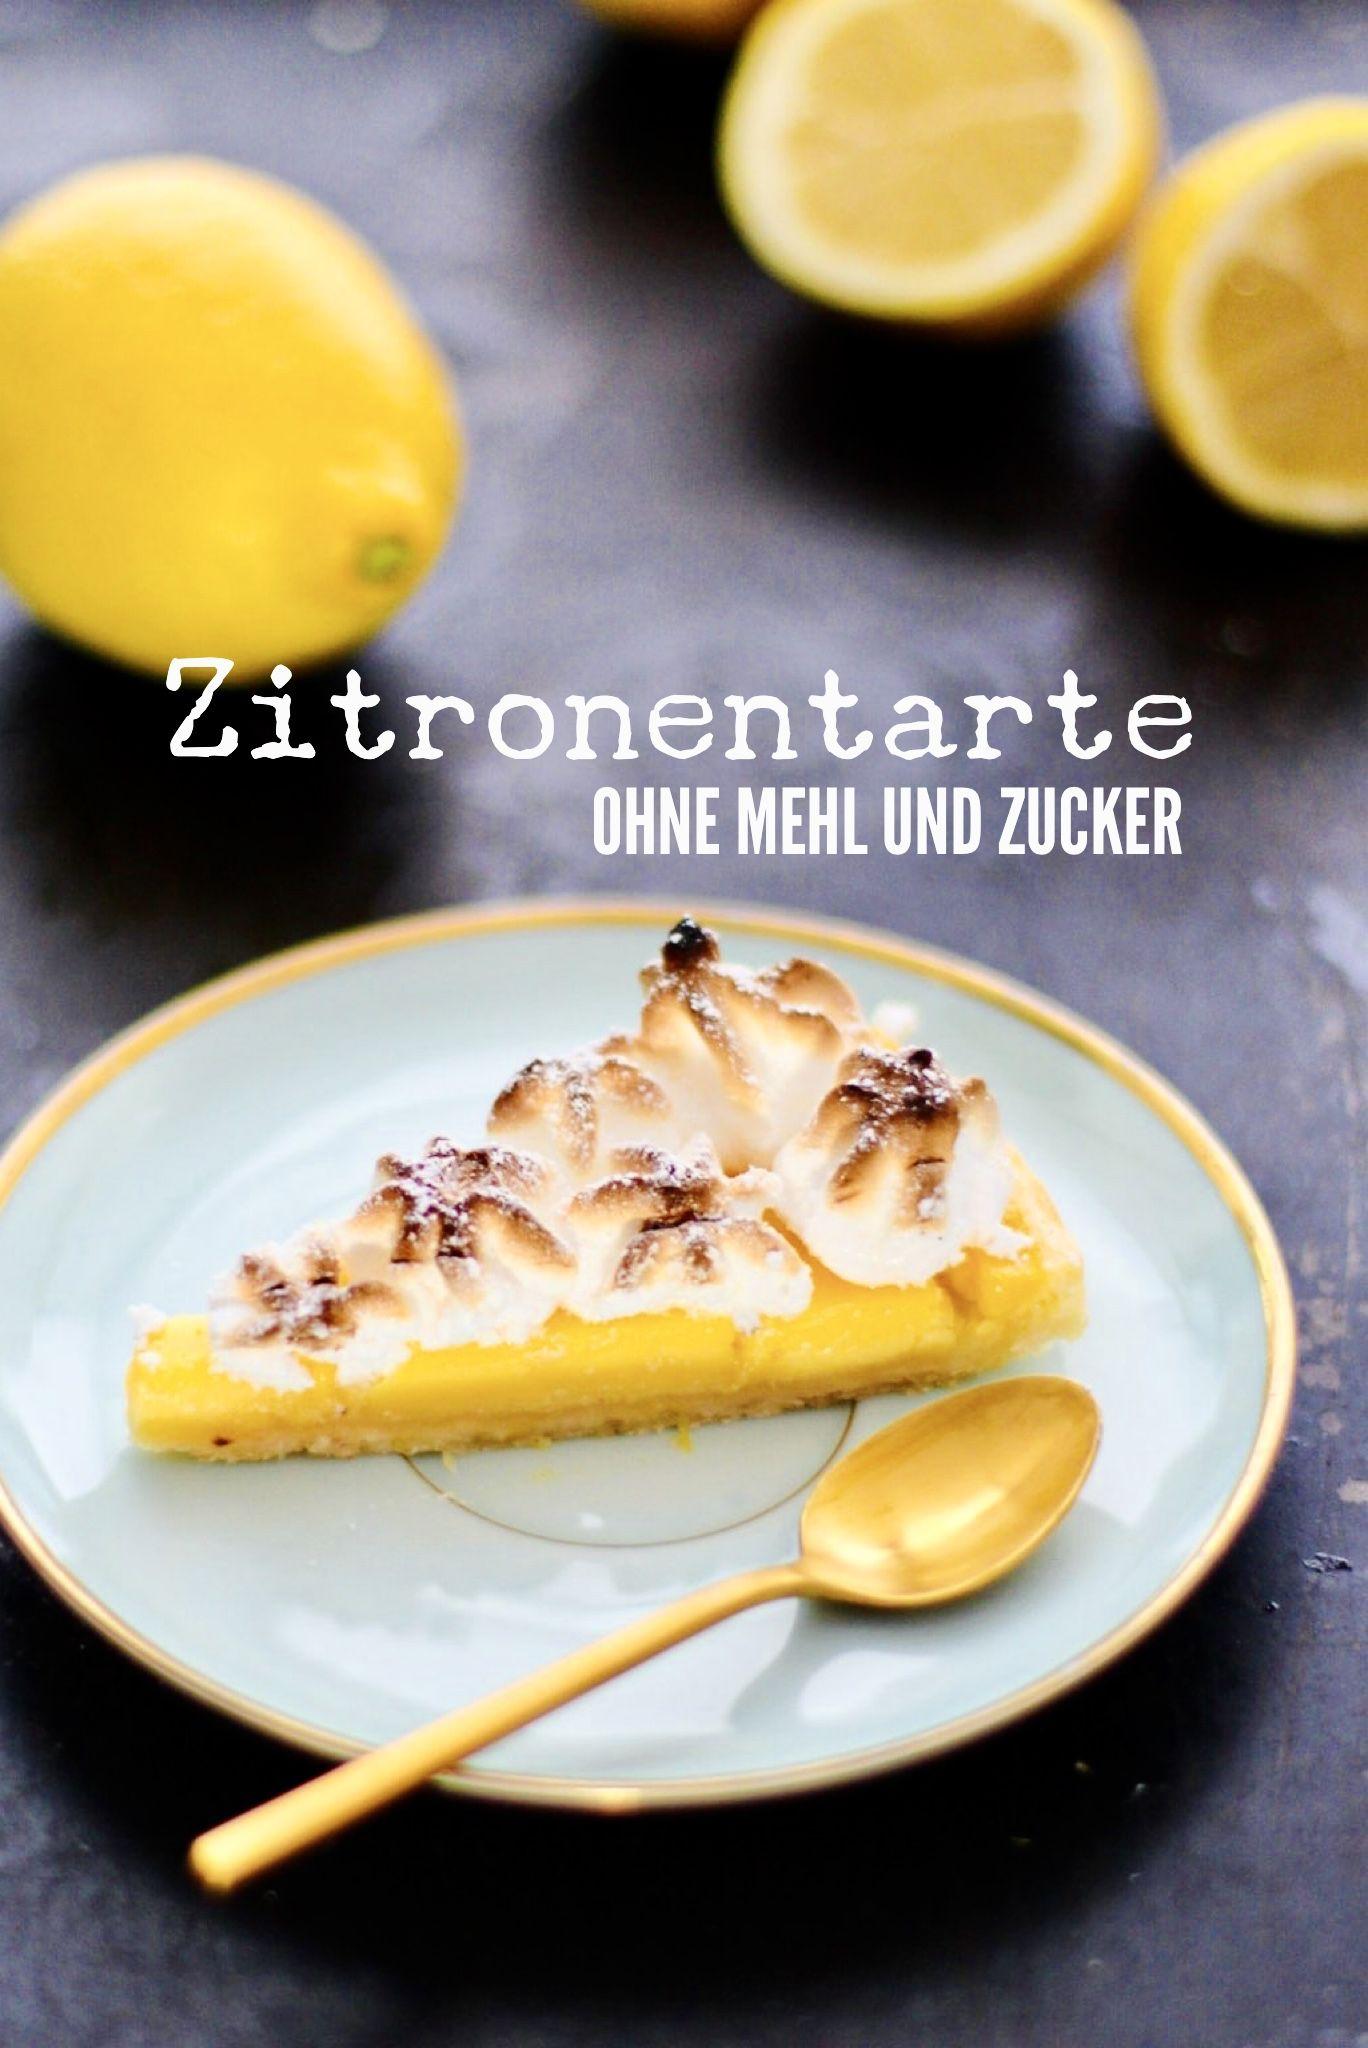 Zitronentarte low carb - Holla die Kochfee